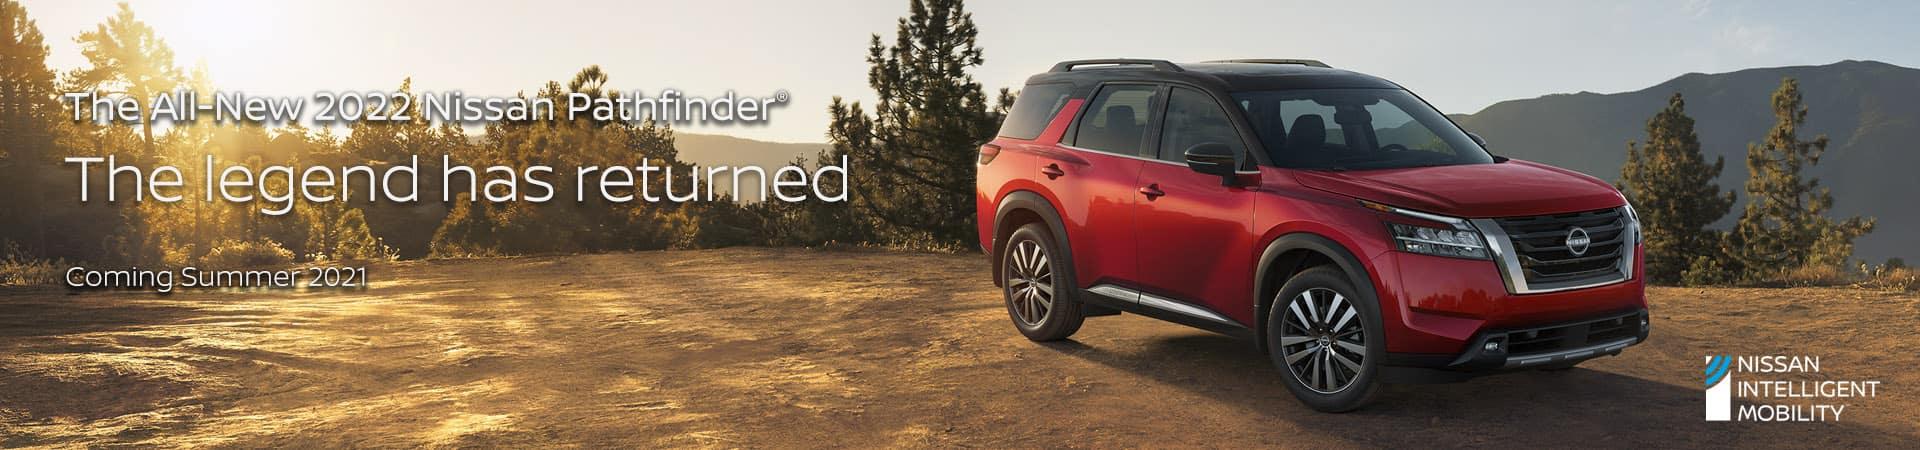 All-New 2022 Nissan Pathfinder